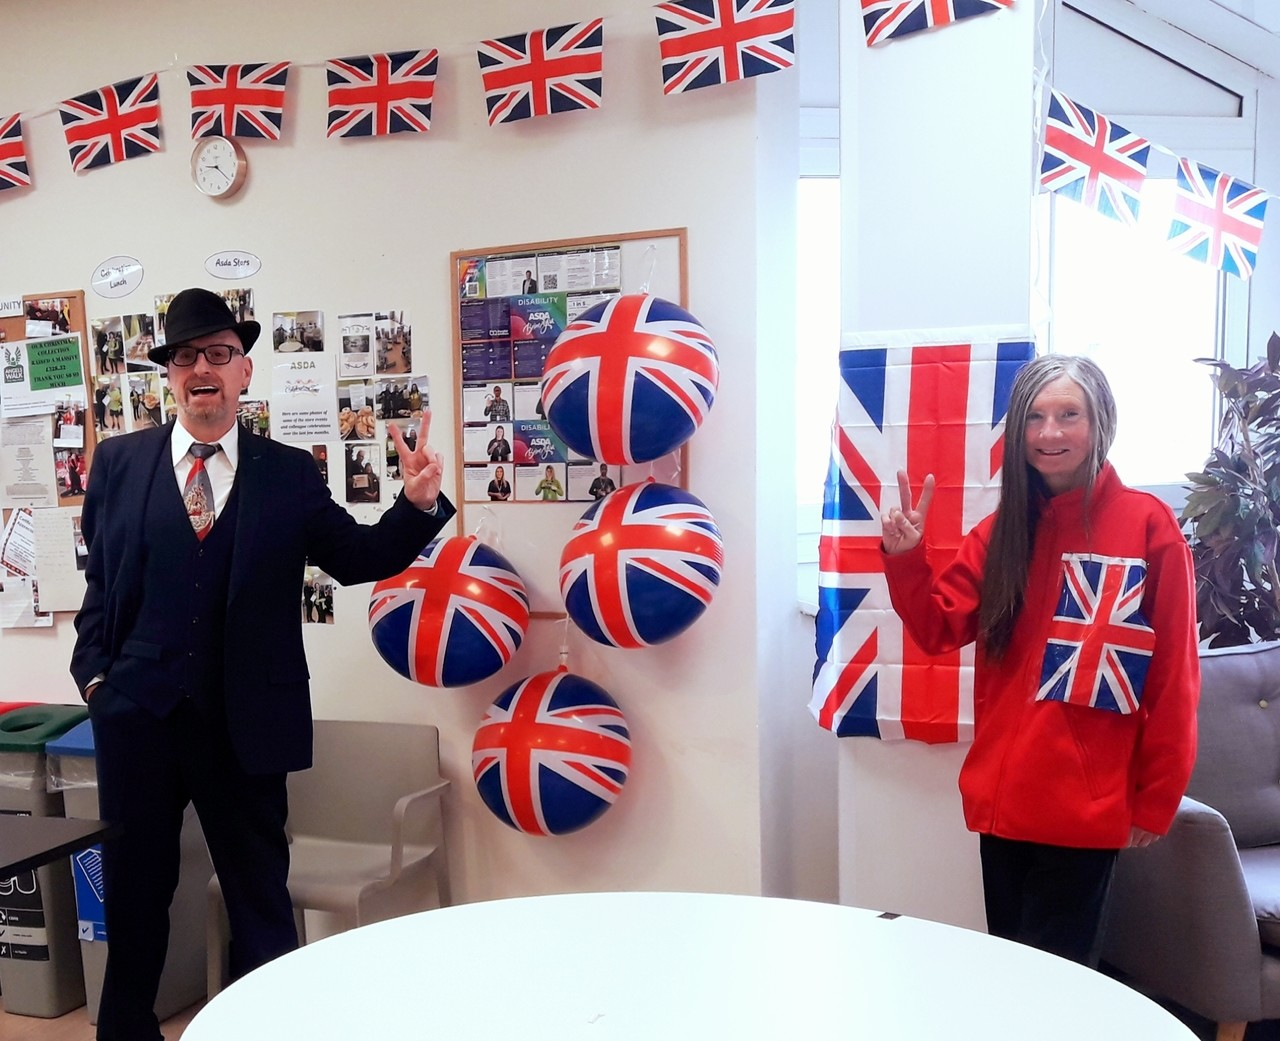 VE Day celebrations | Asda Brighton Marina